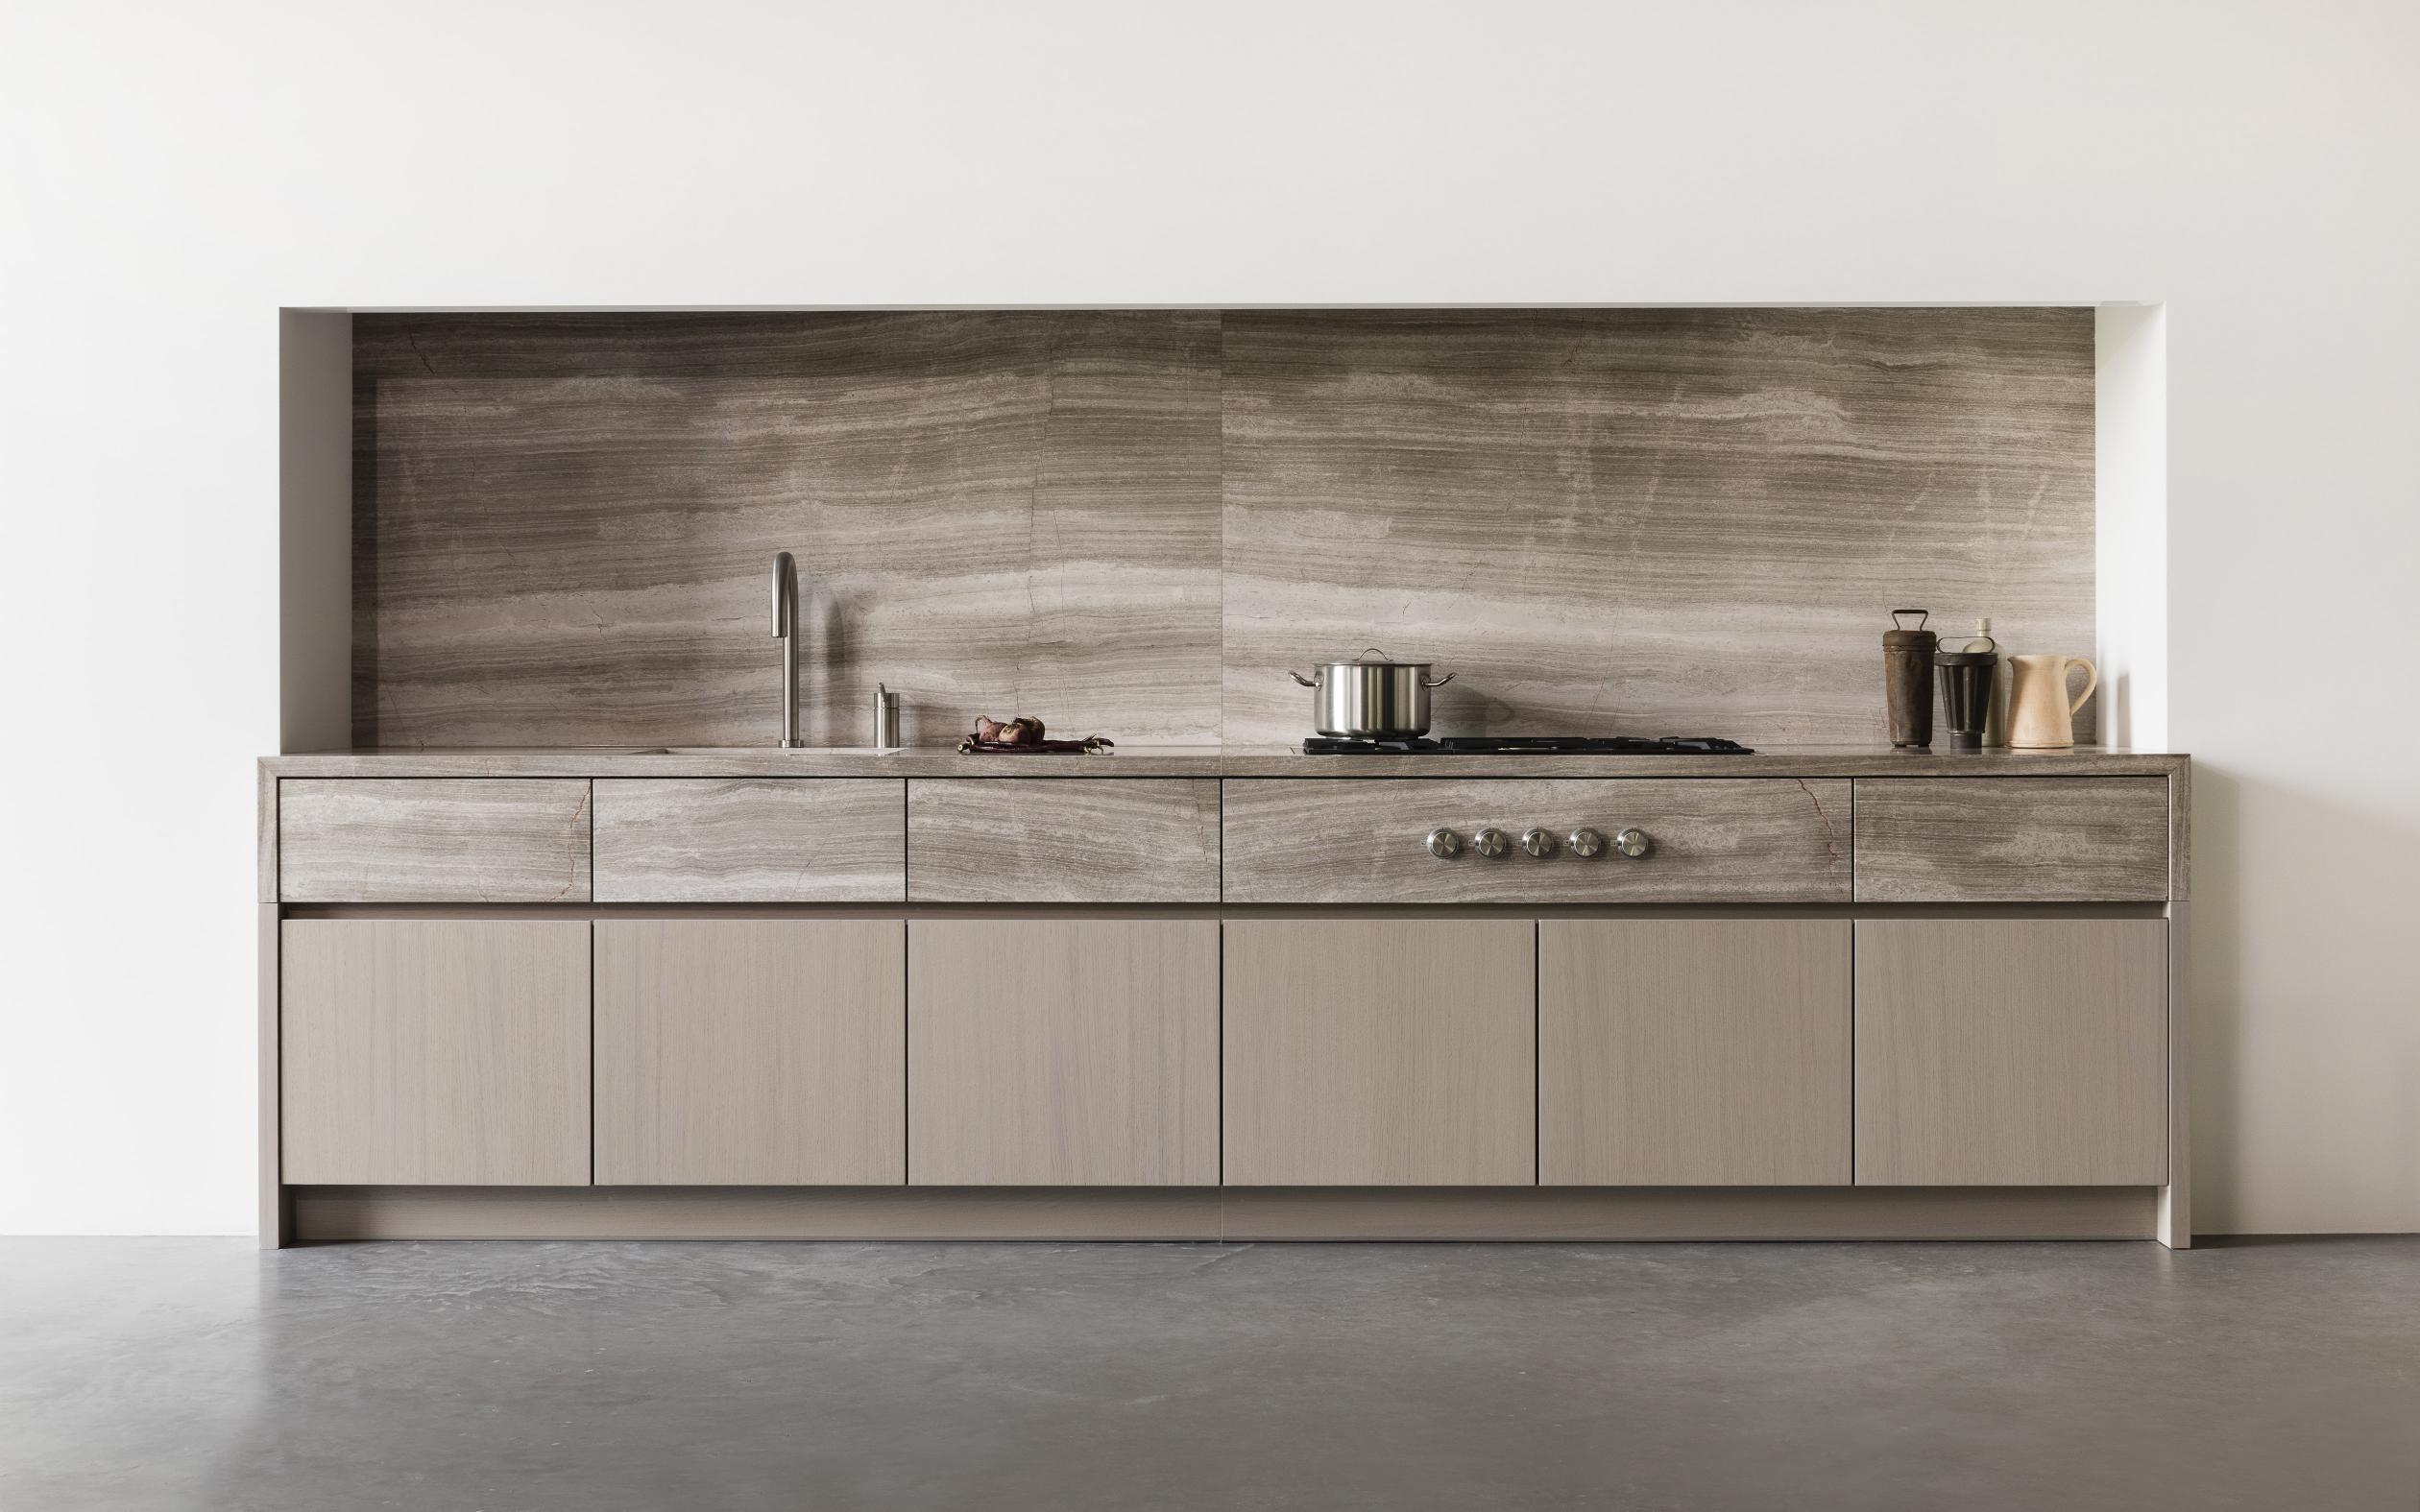 BRUTAL kitchen